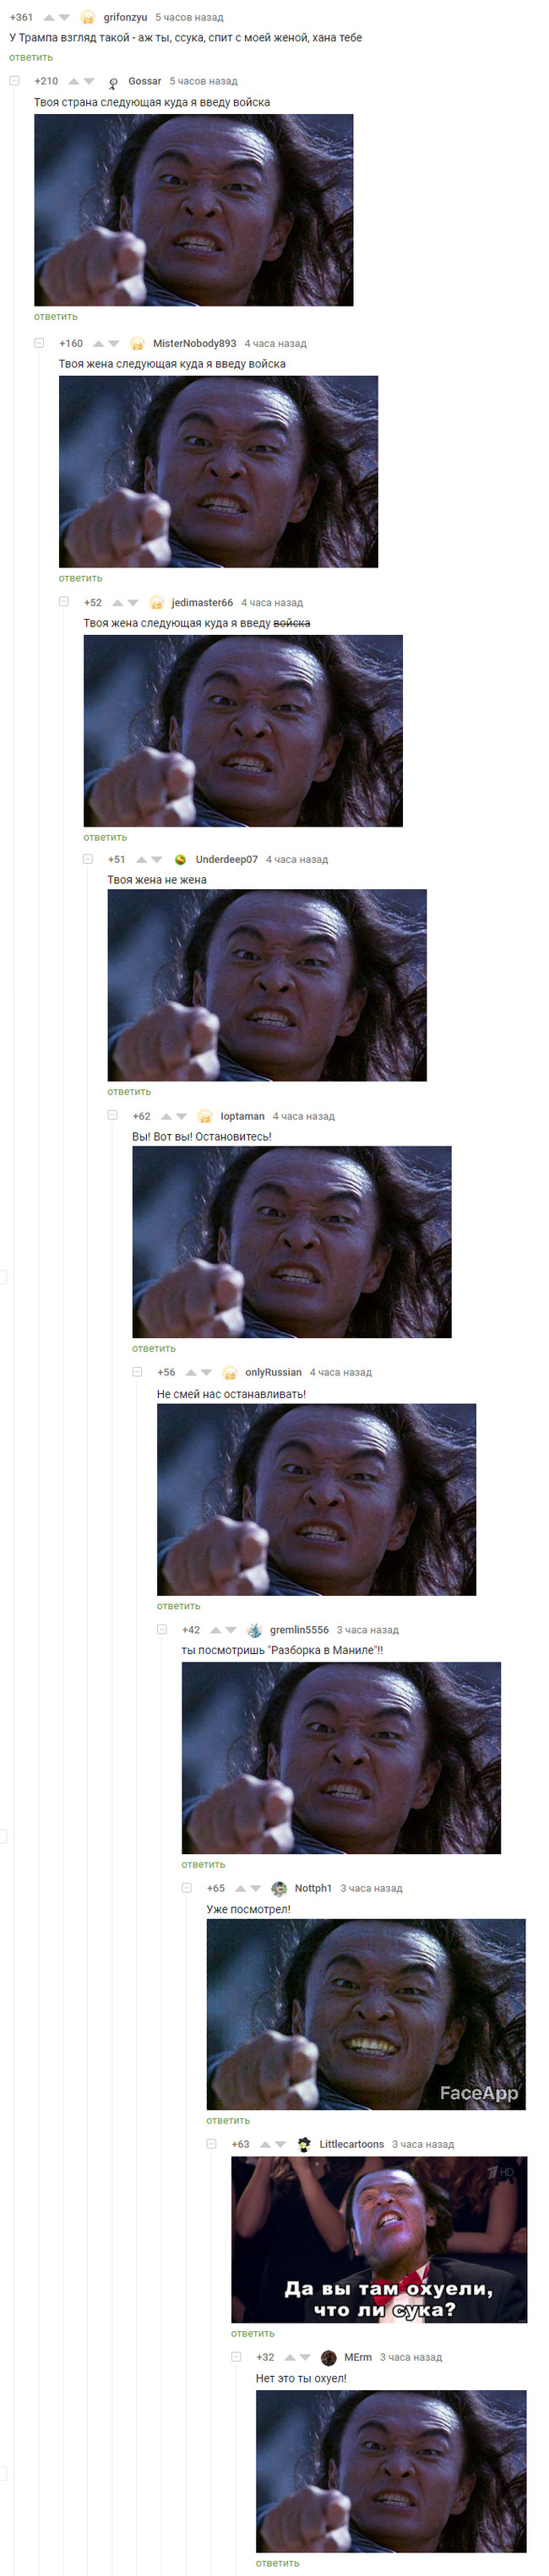 Безумие Shang tsung, Безумие, Скриншот, Комментарии, Длиннопост